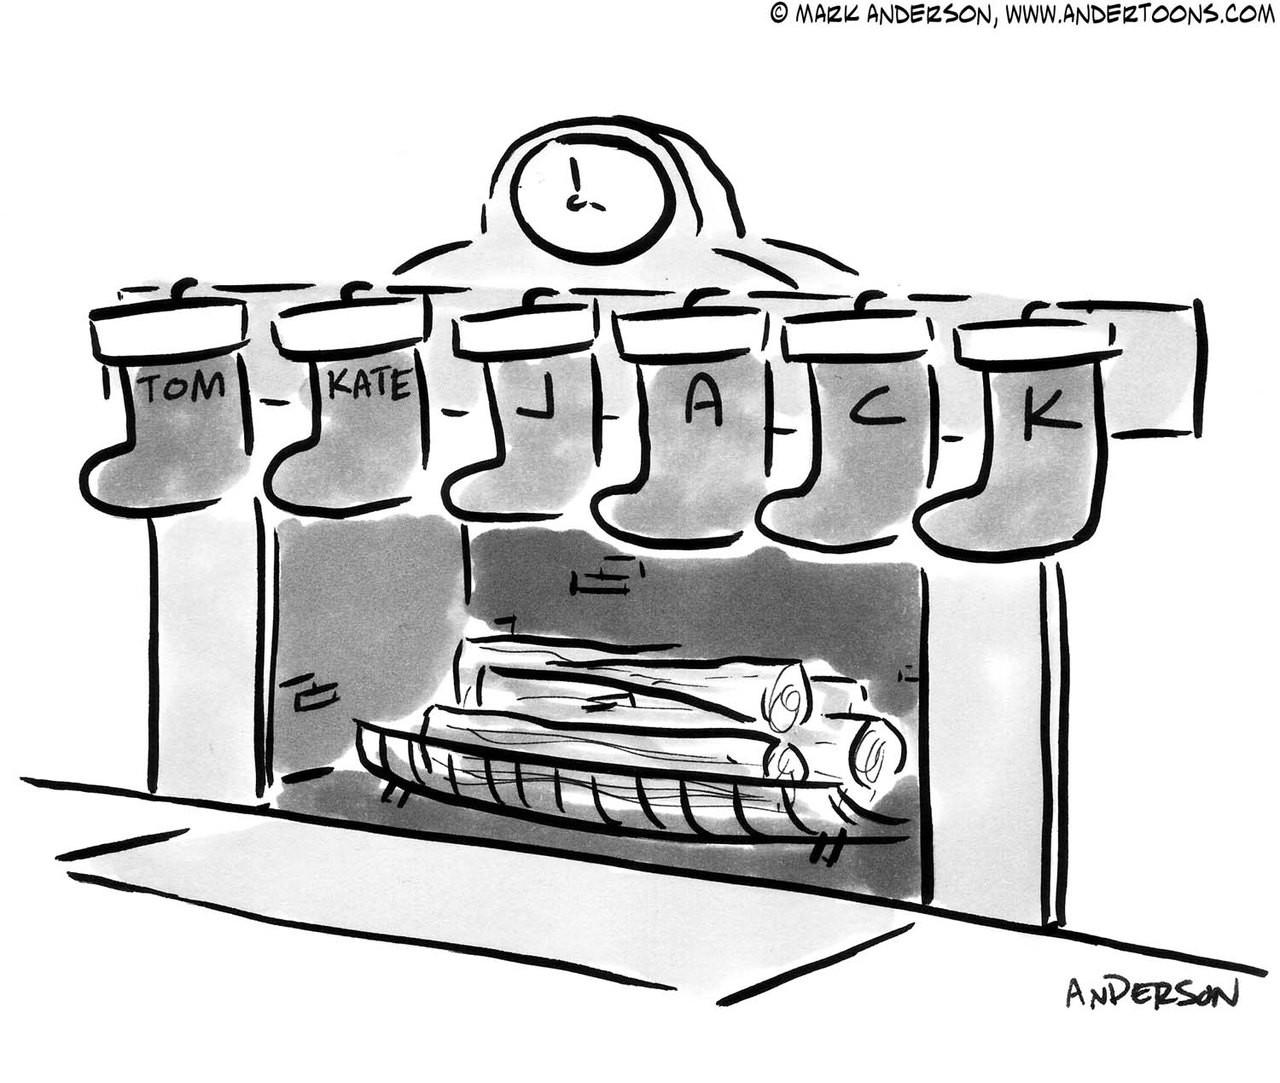 Christmas Cartoon # 5978 - ANDERTOONS